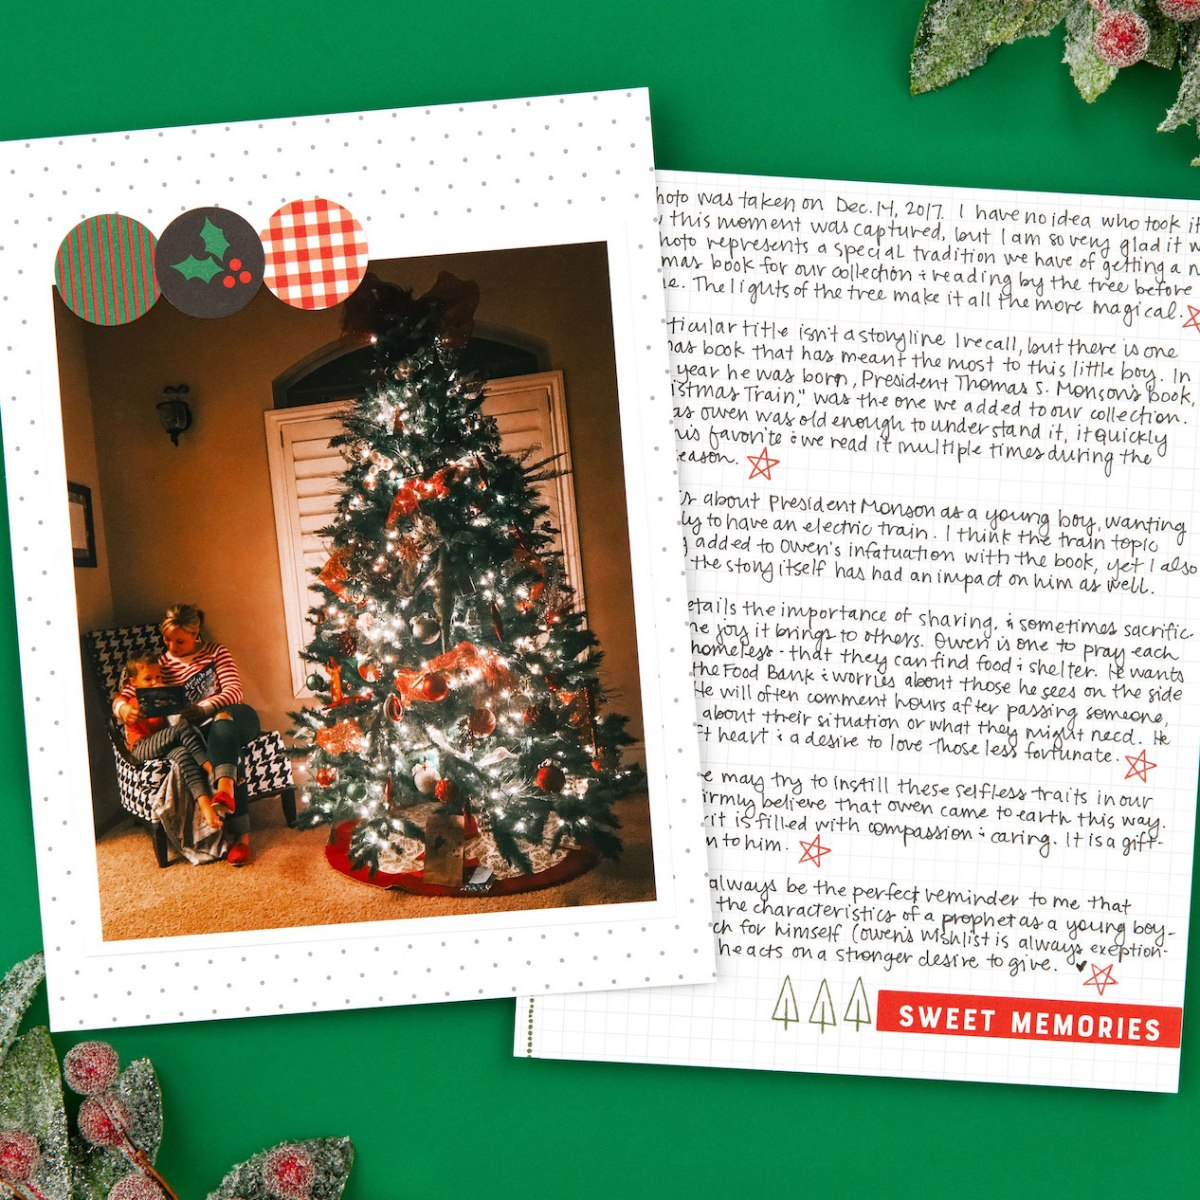 Holiday Stories I Love #ctmh #closetomyheart #storybystacy #holidaystoriesilove #storiesilove #storytelling #memorykeeping #scrapbooking #holiday #christmas